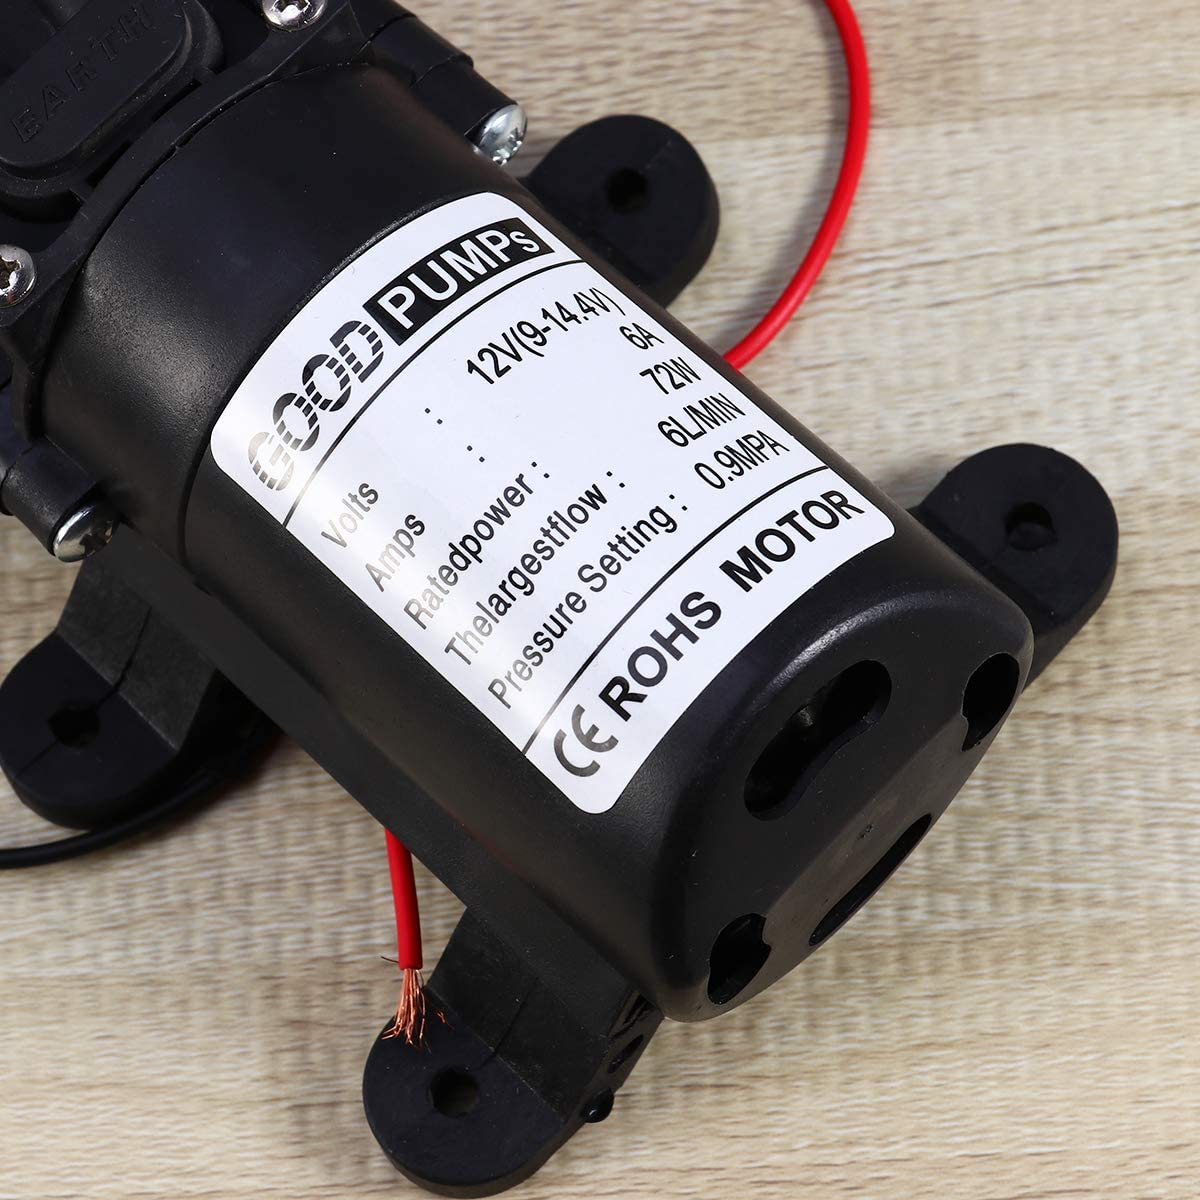 Vosarea 12V 72W Water Pump Diaphragm Pump Mini Electric Car Washing Pump Straight Pipe for Camper Marine Boat Black